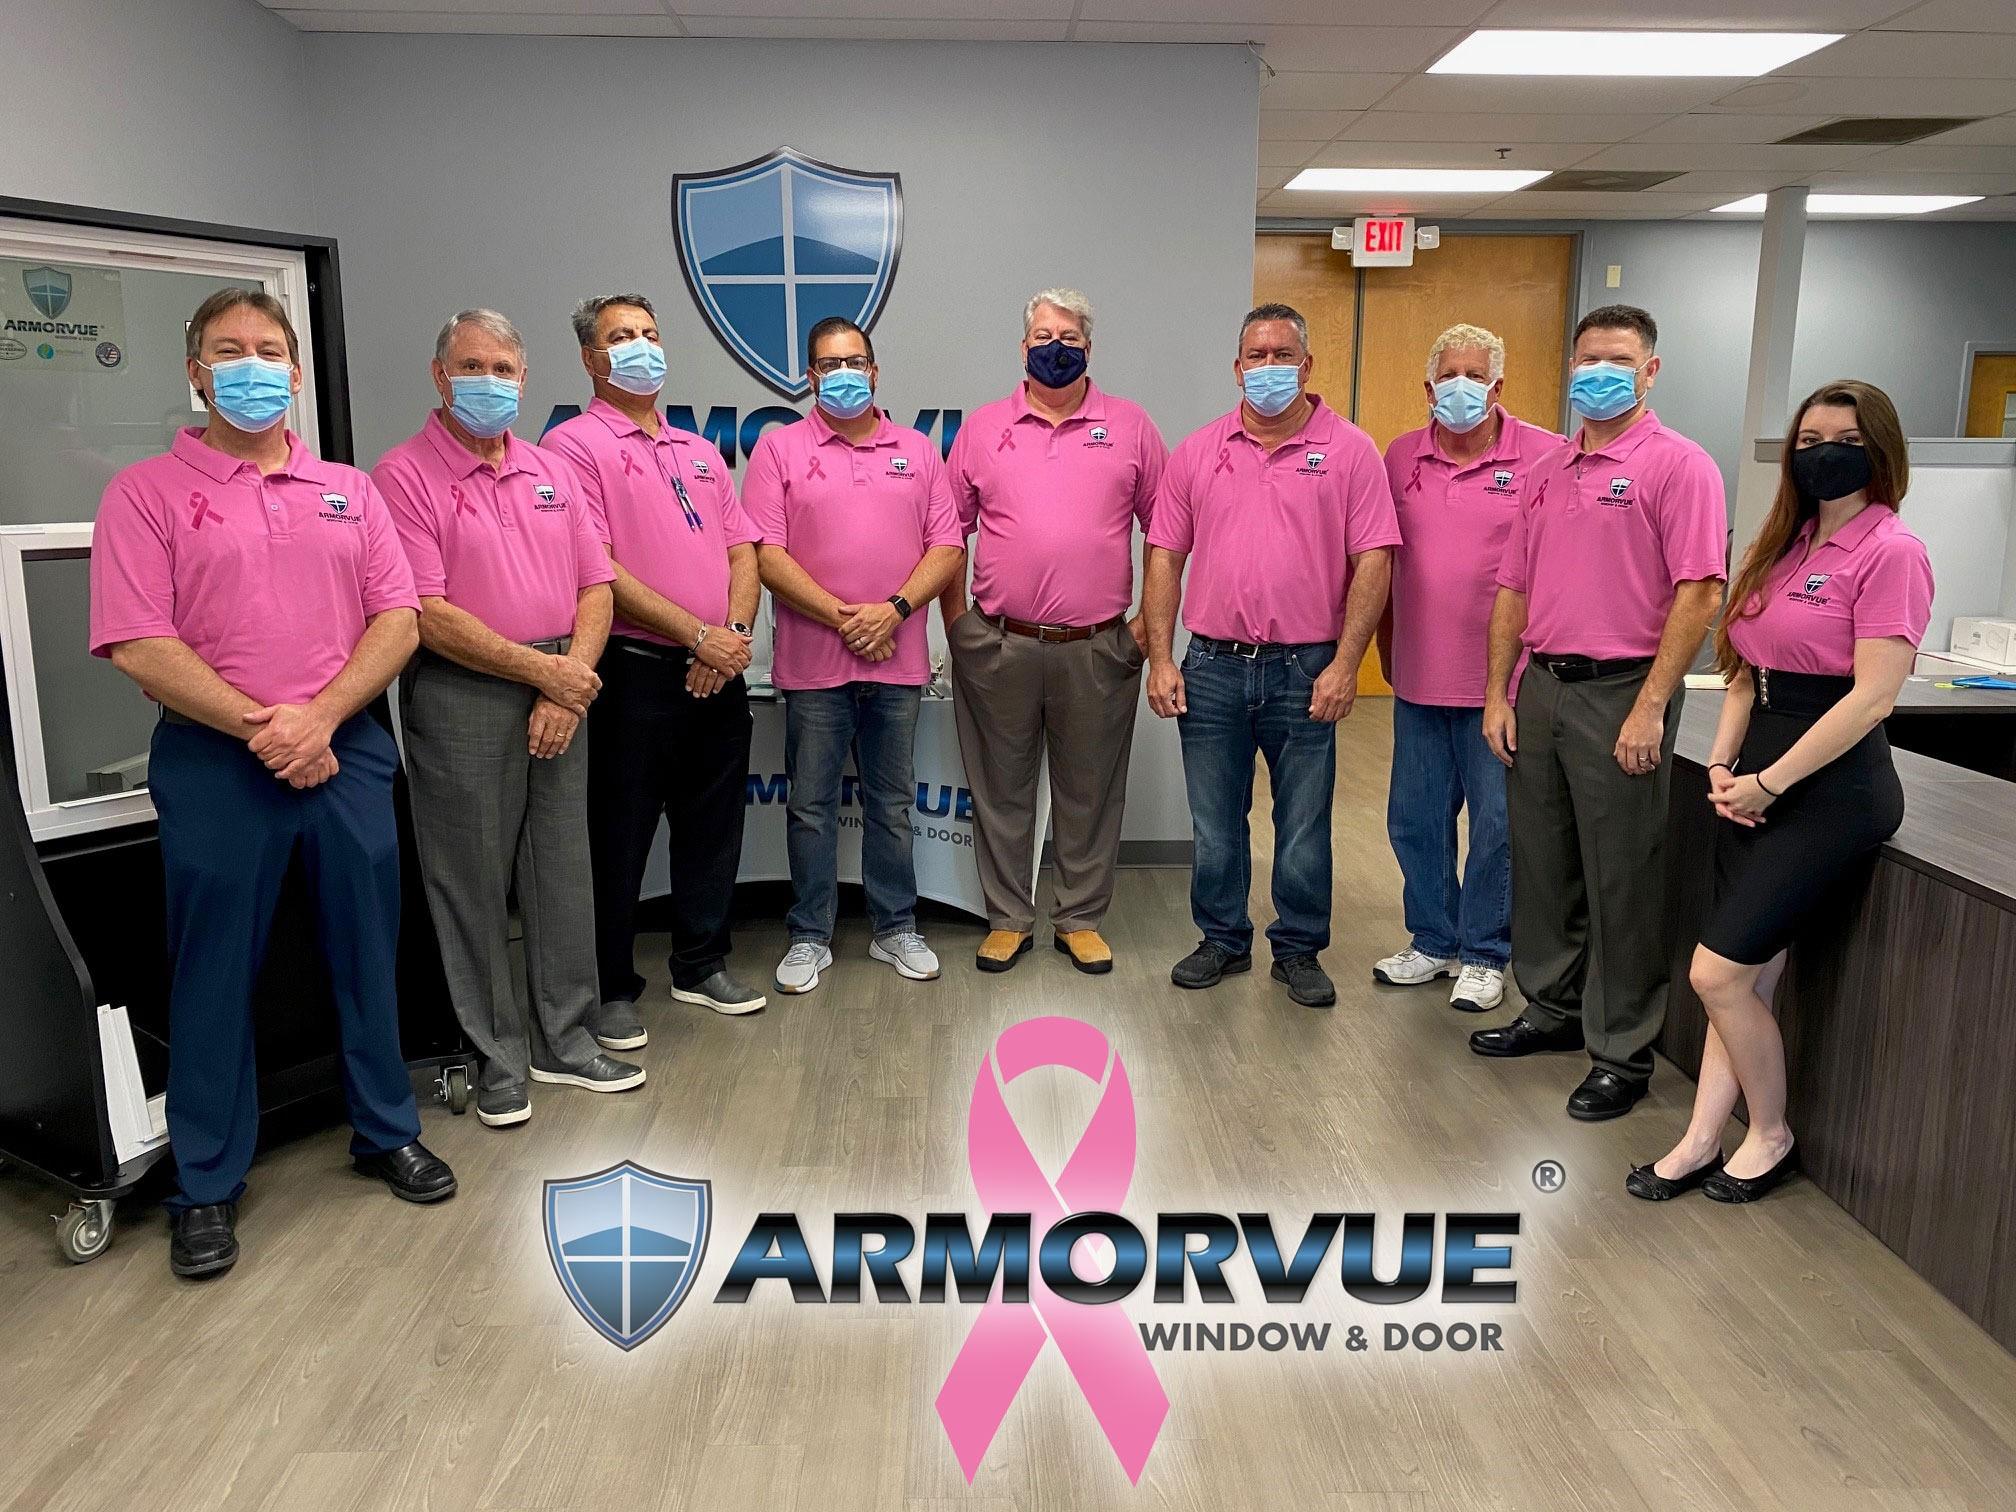 Armorvue Orlando Goes Pink for October